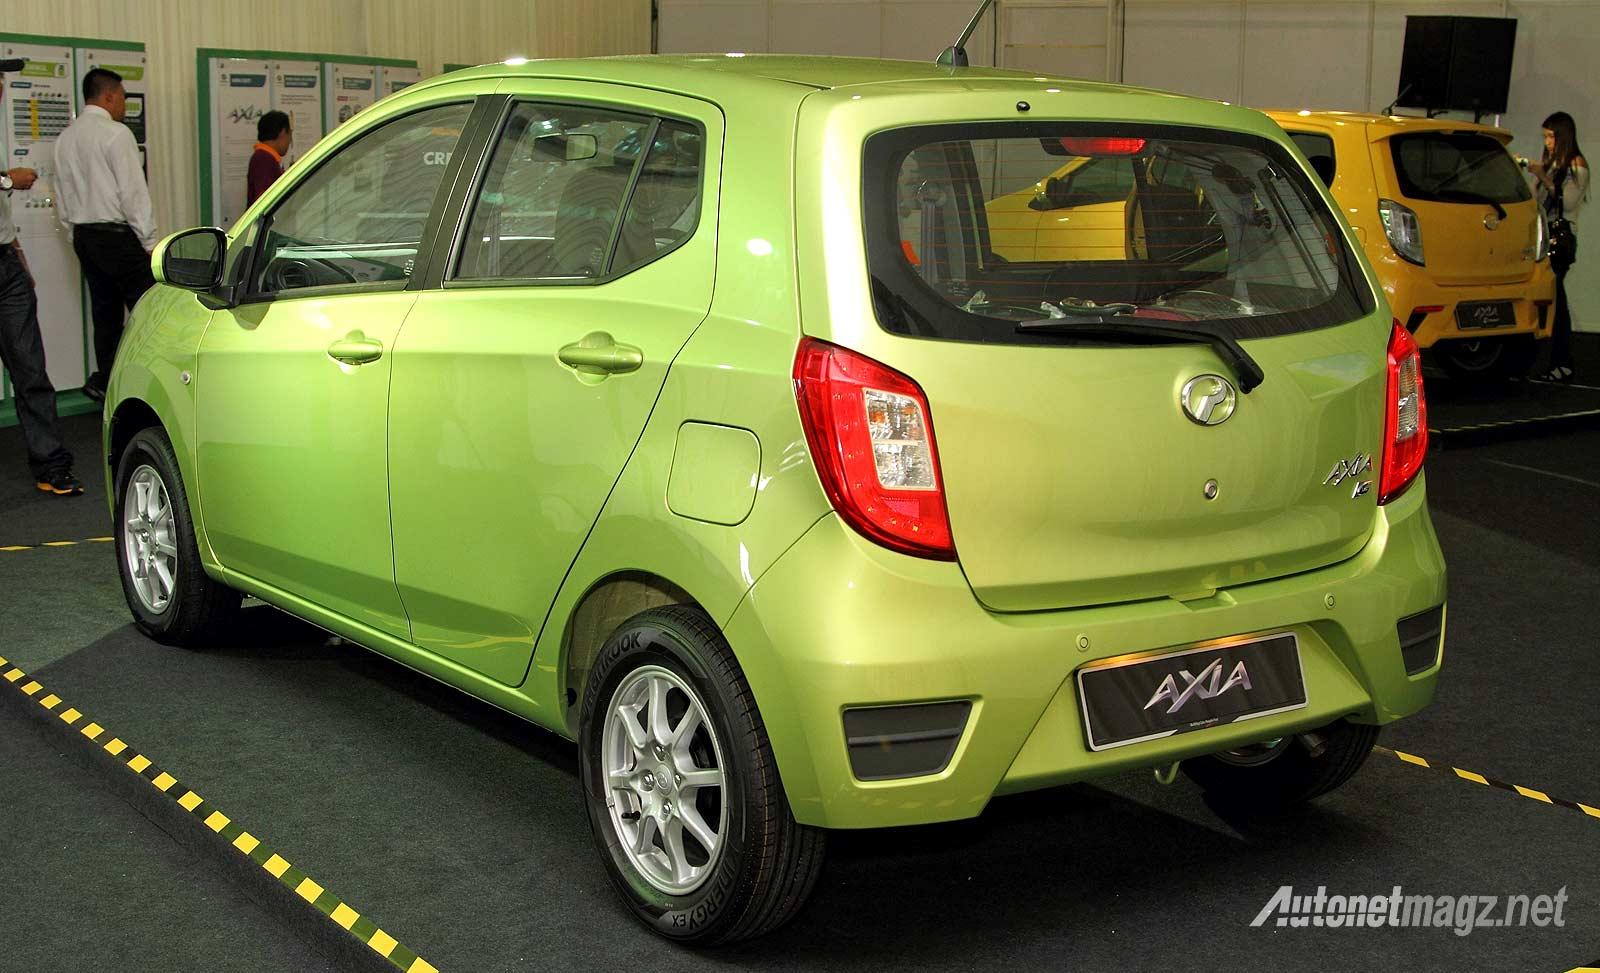 Harga Perodua Axia Si Kembar Daihatsu Ayla Dan Toyota Agya